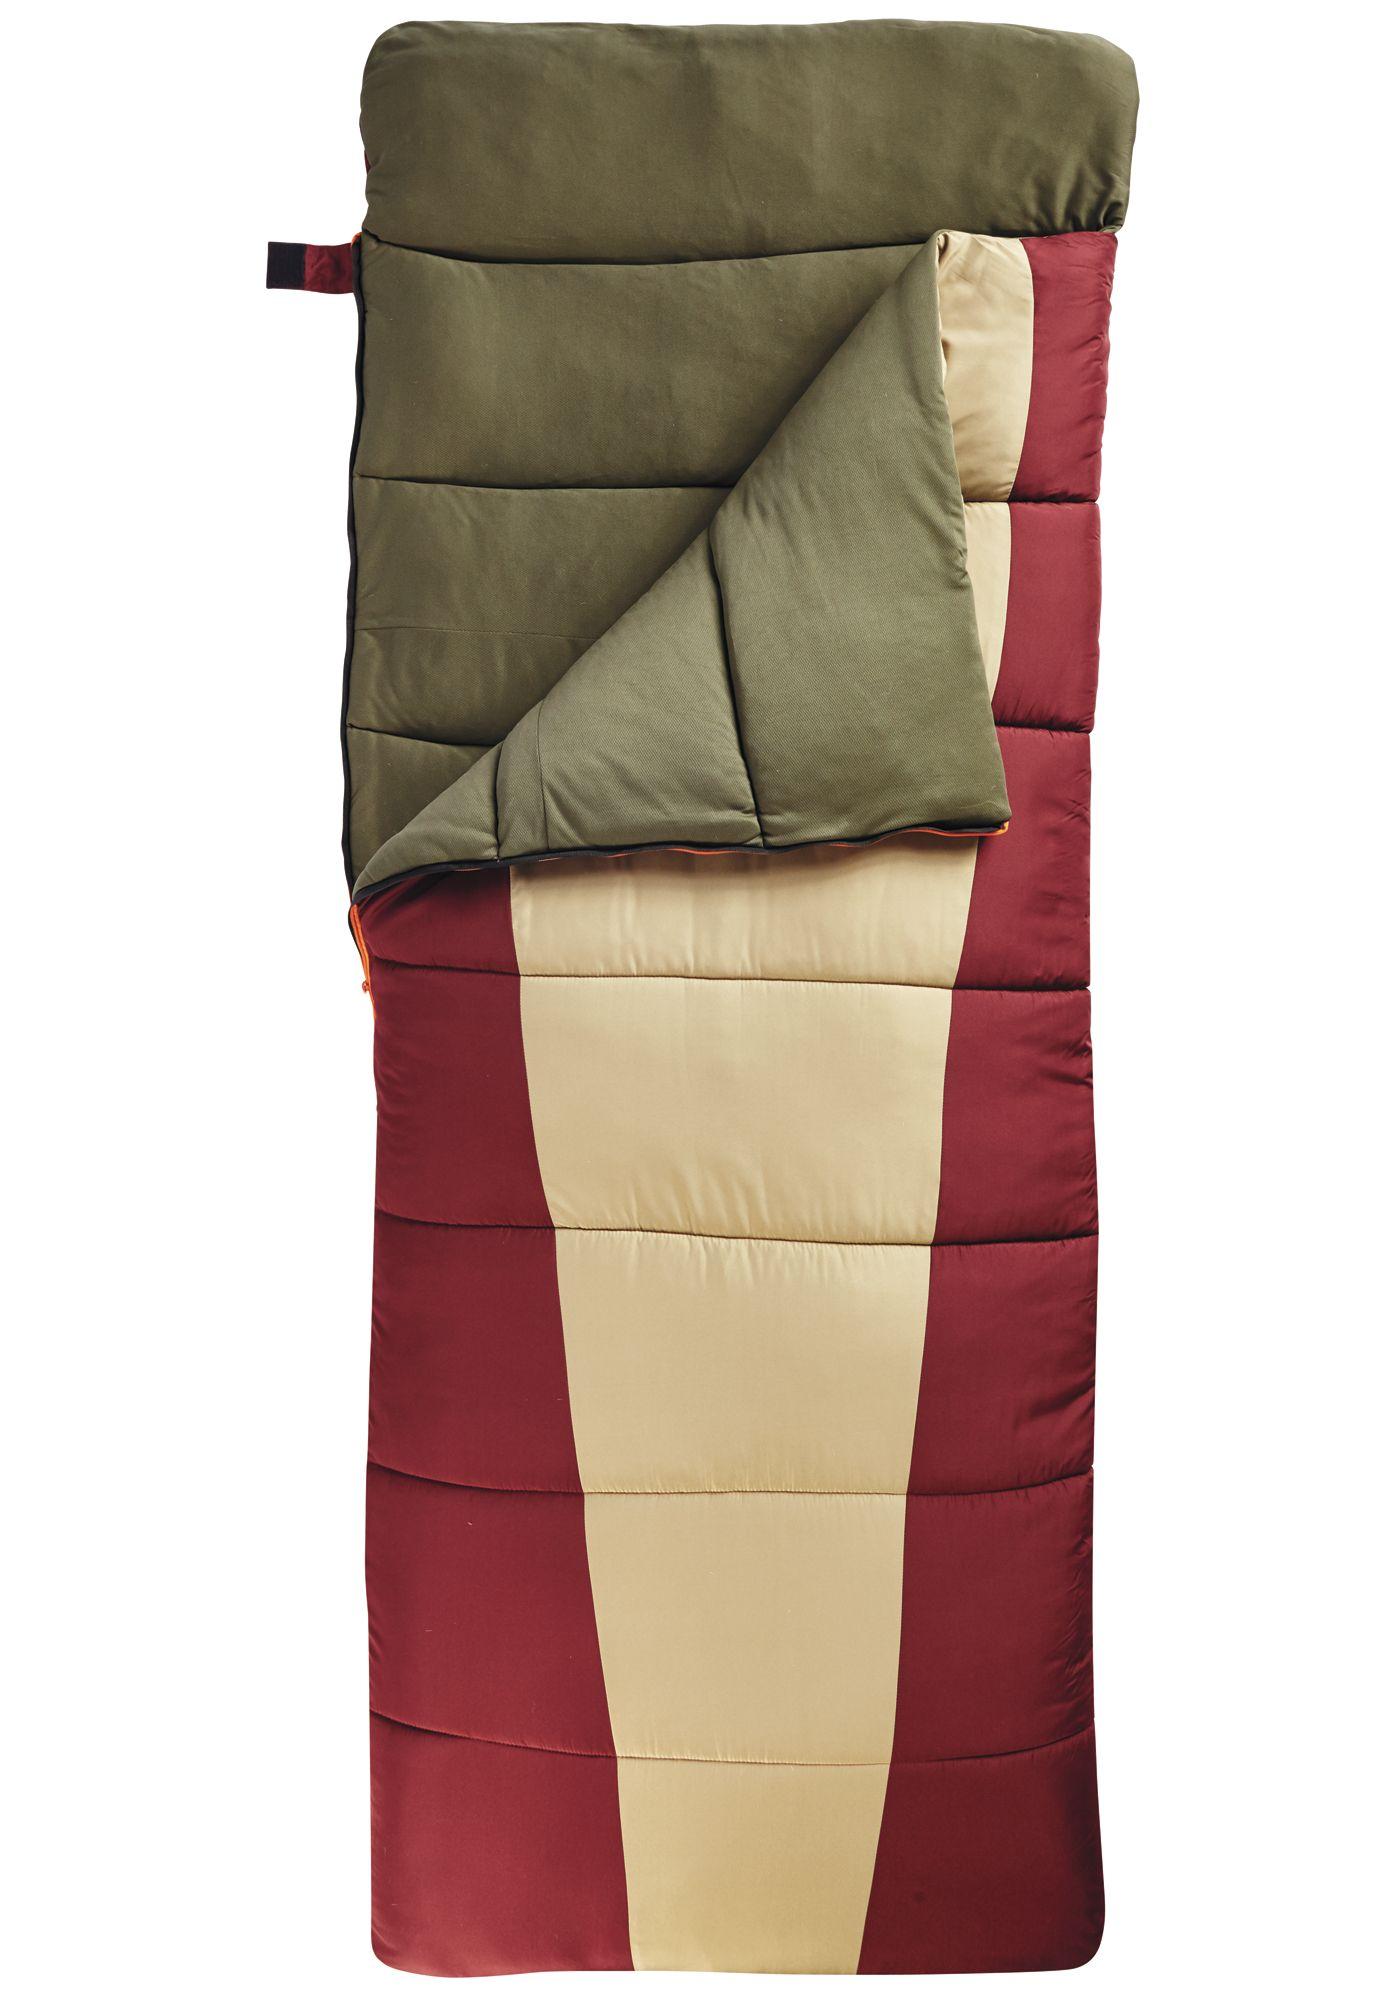 Field & Stream Field Master 40°F Sleeping Bag